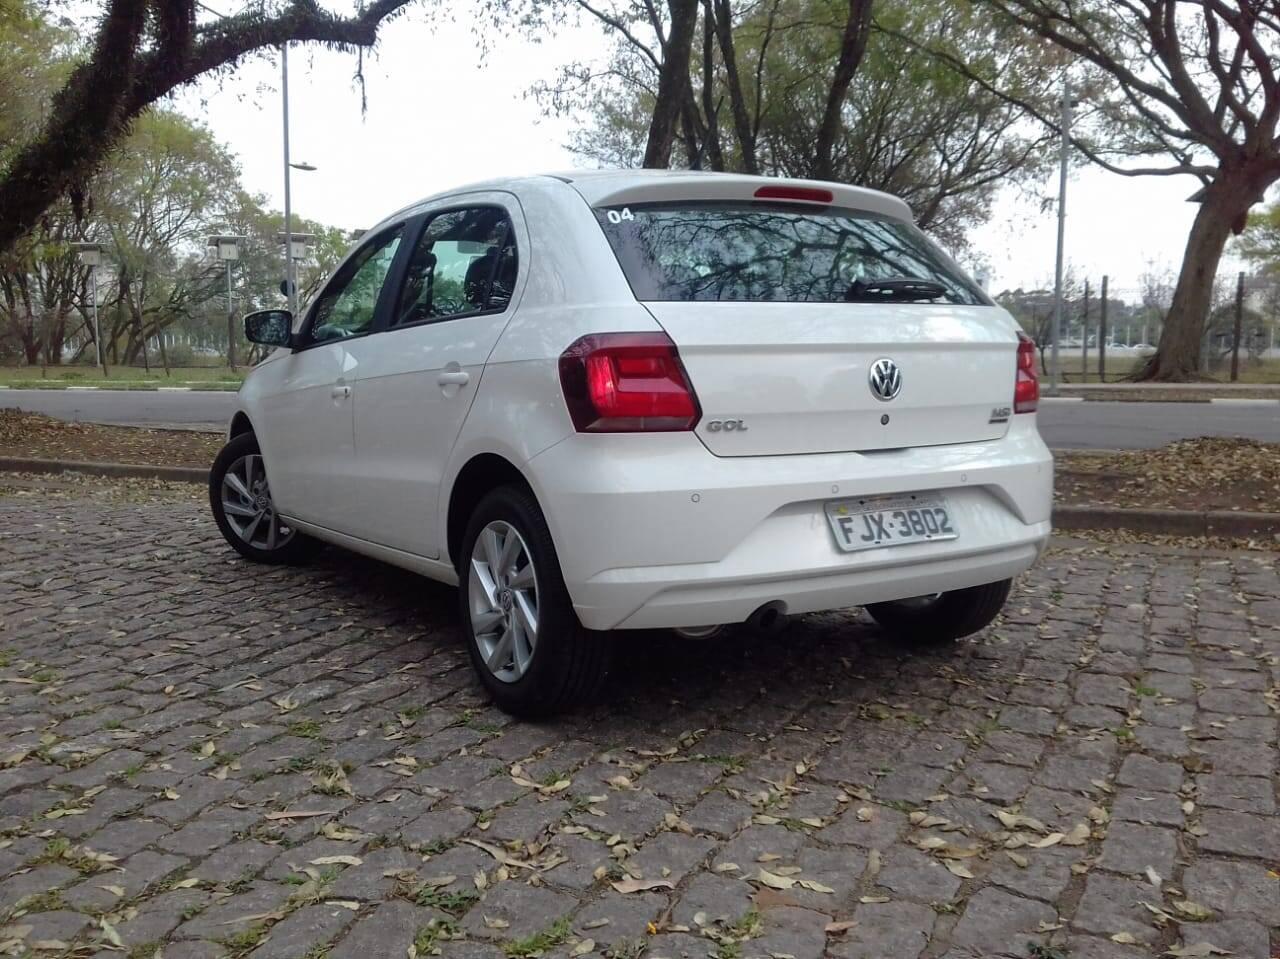 VW Gol 1.6 AT. Foto: Carlos Guimarães/iG